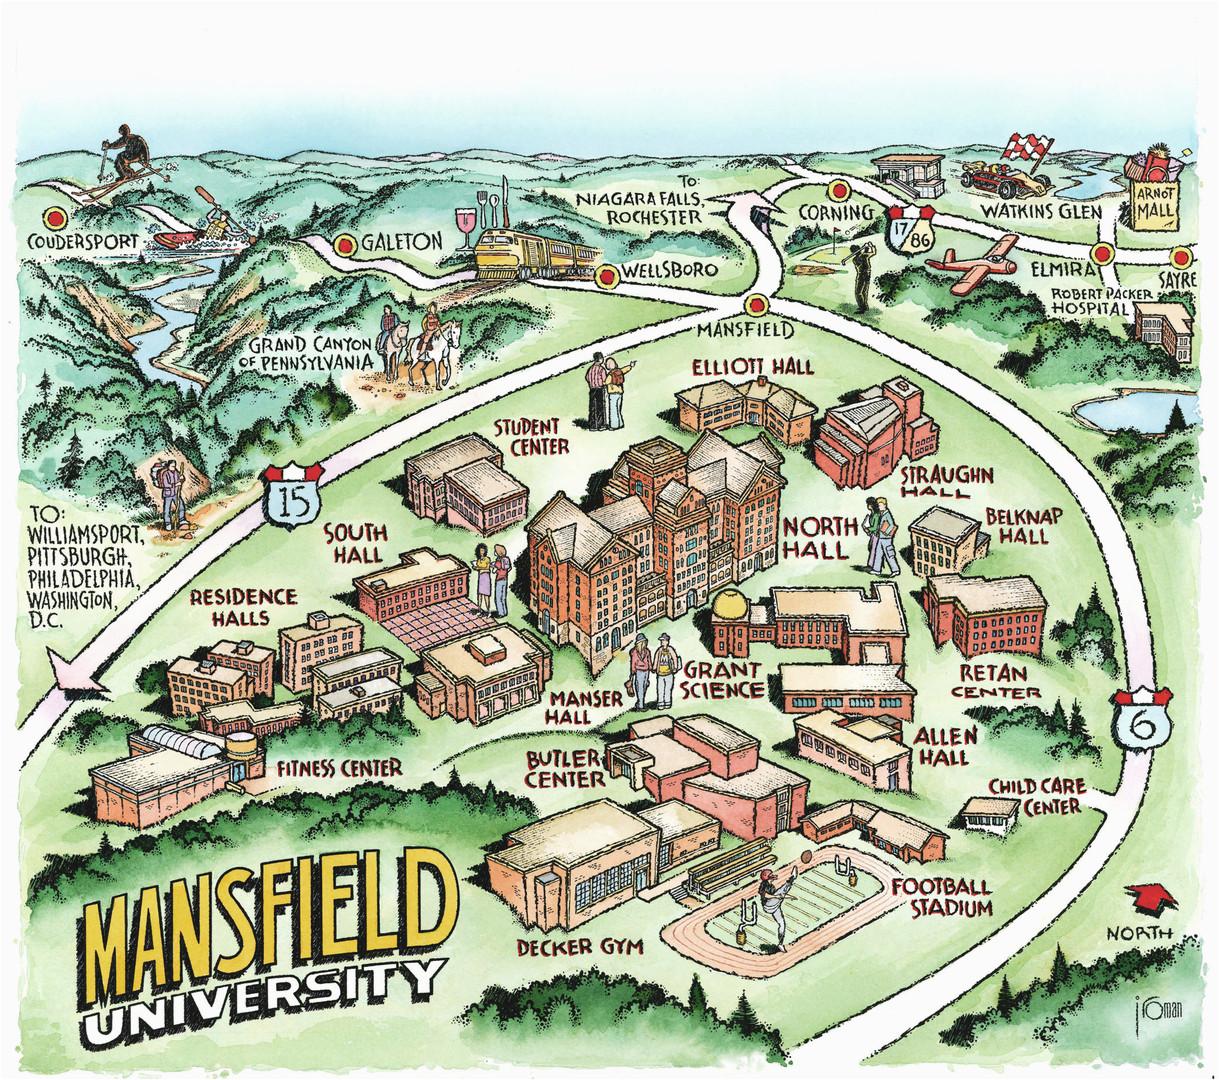 Miami University Ohio Campus Map | secretmuseum on university of pittsburgh street map, presbyterian hospital pittsburgh campus map, u of minn campus map, upmc pittsburgh map,